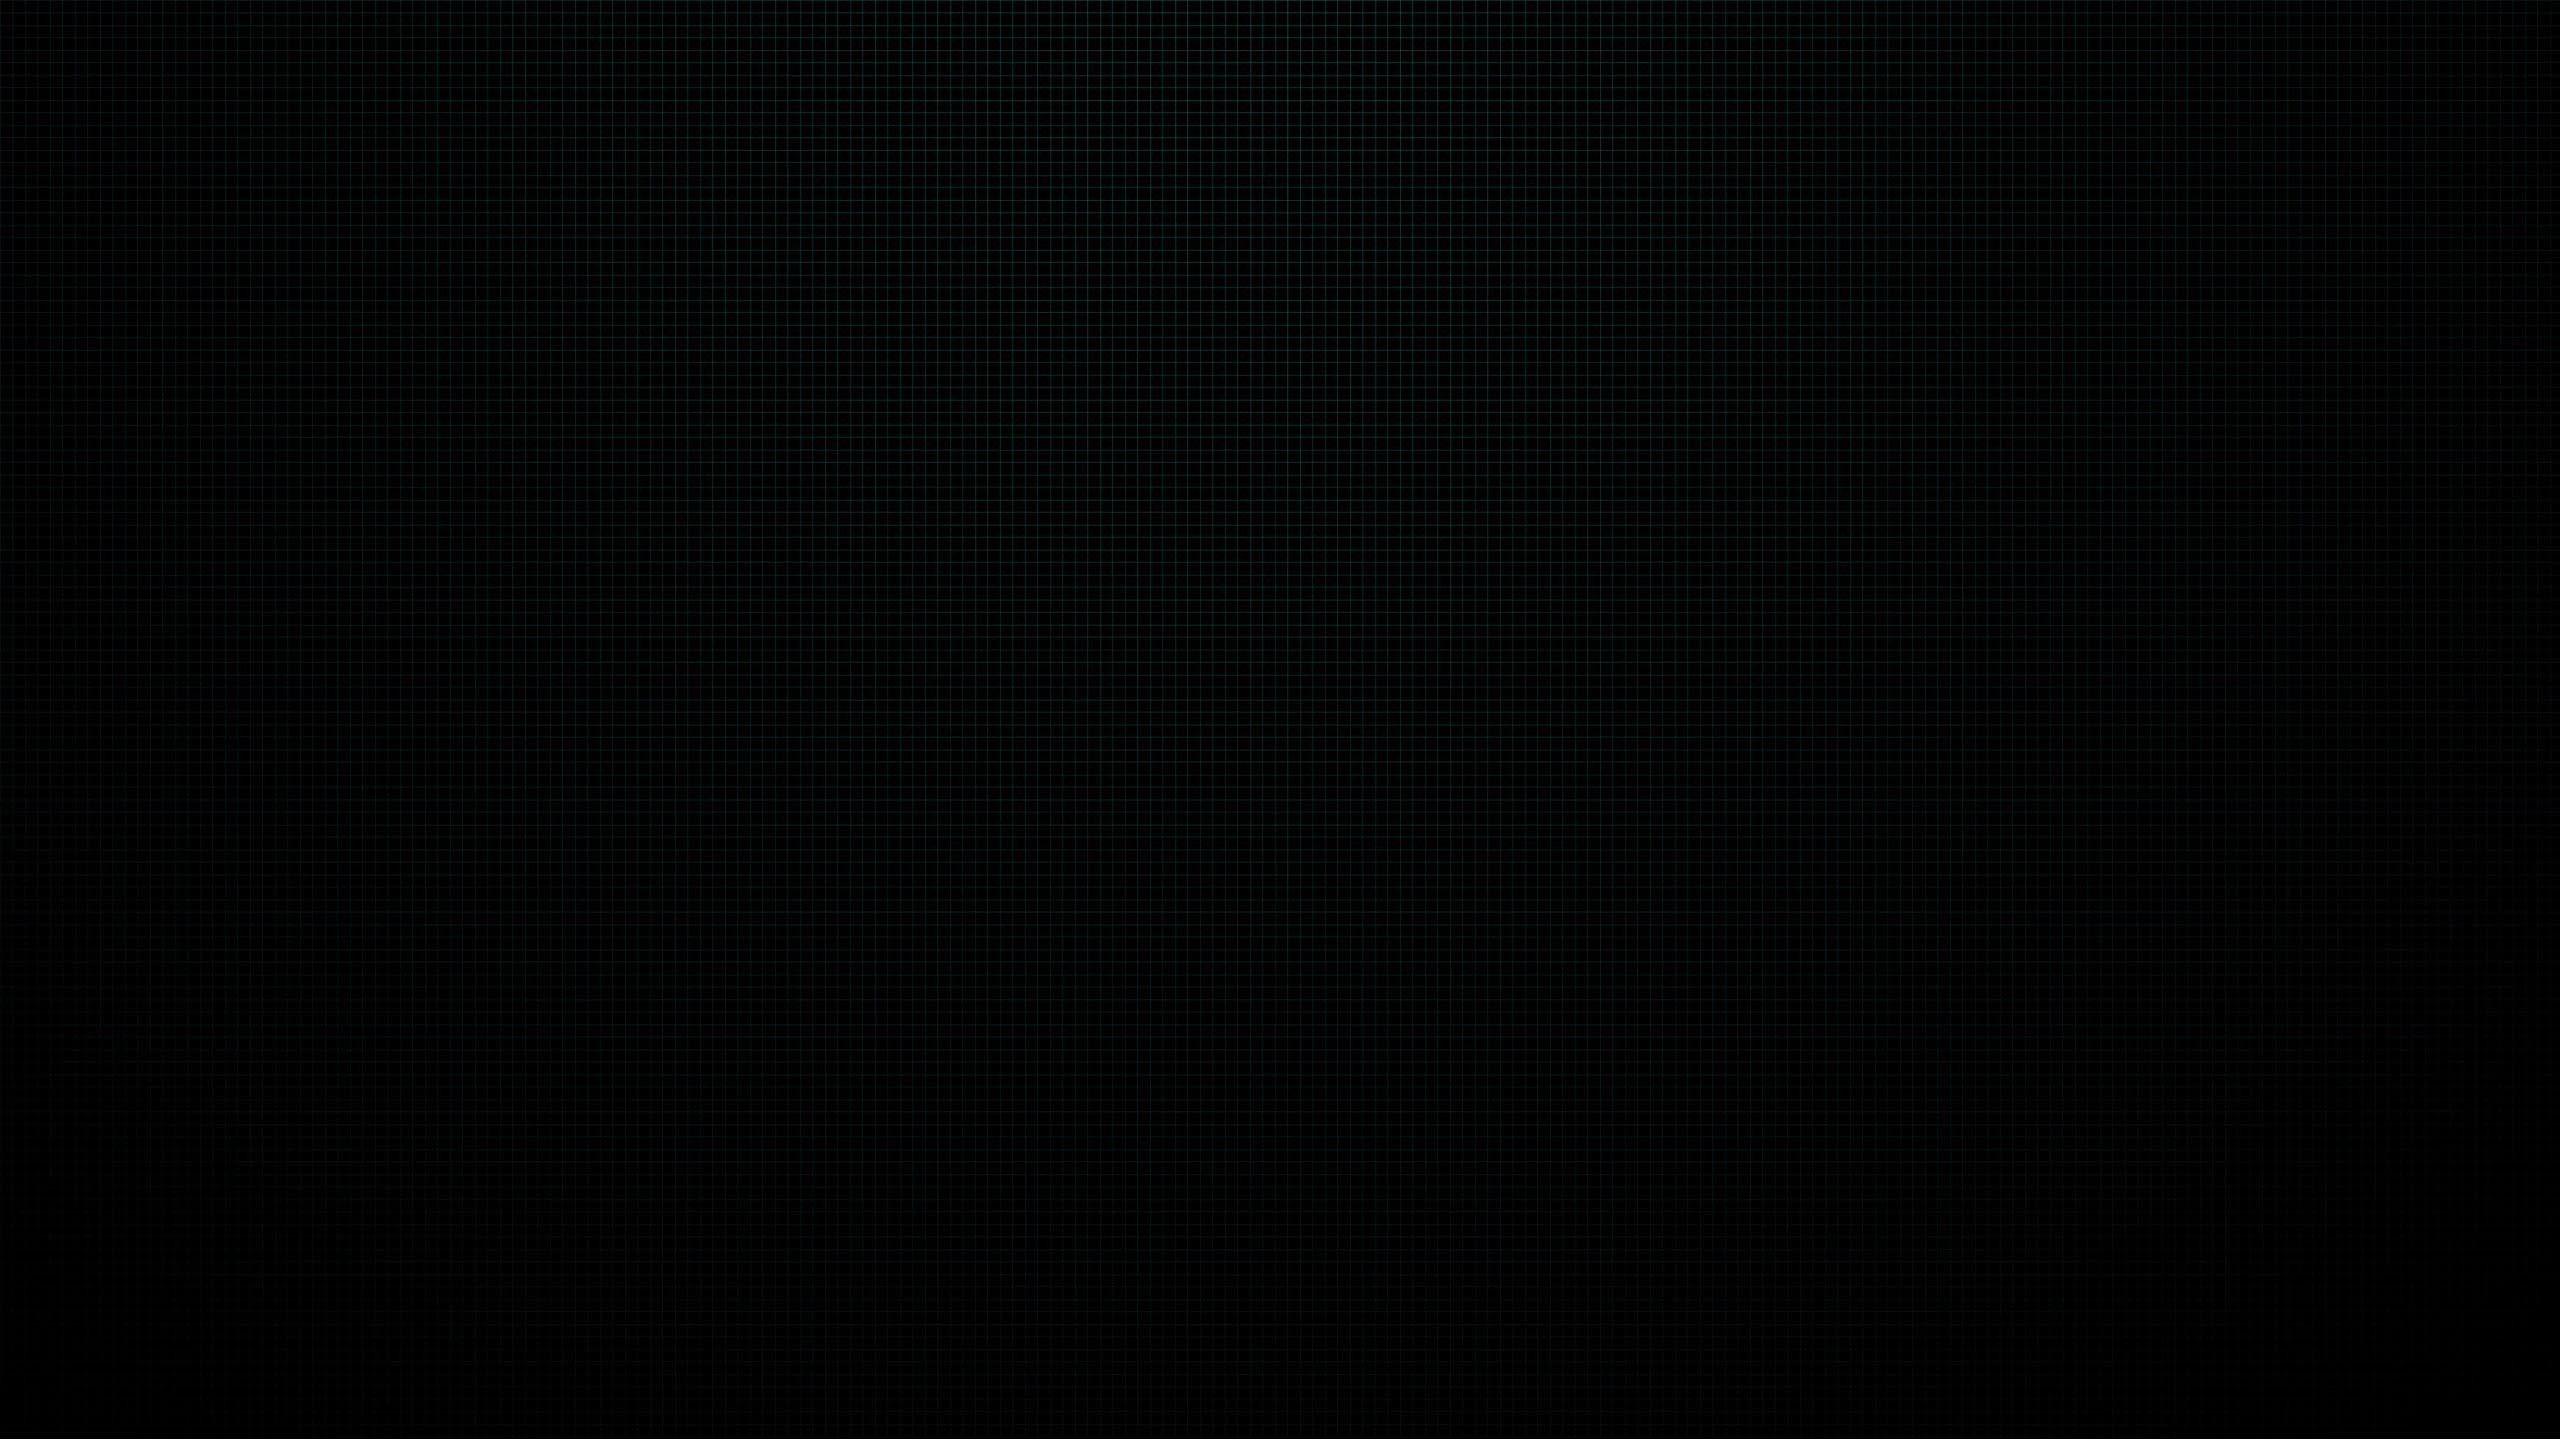 Solid Black Wallpapers on WallpaperDog